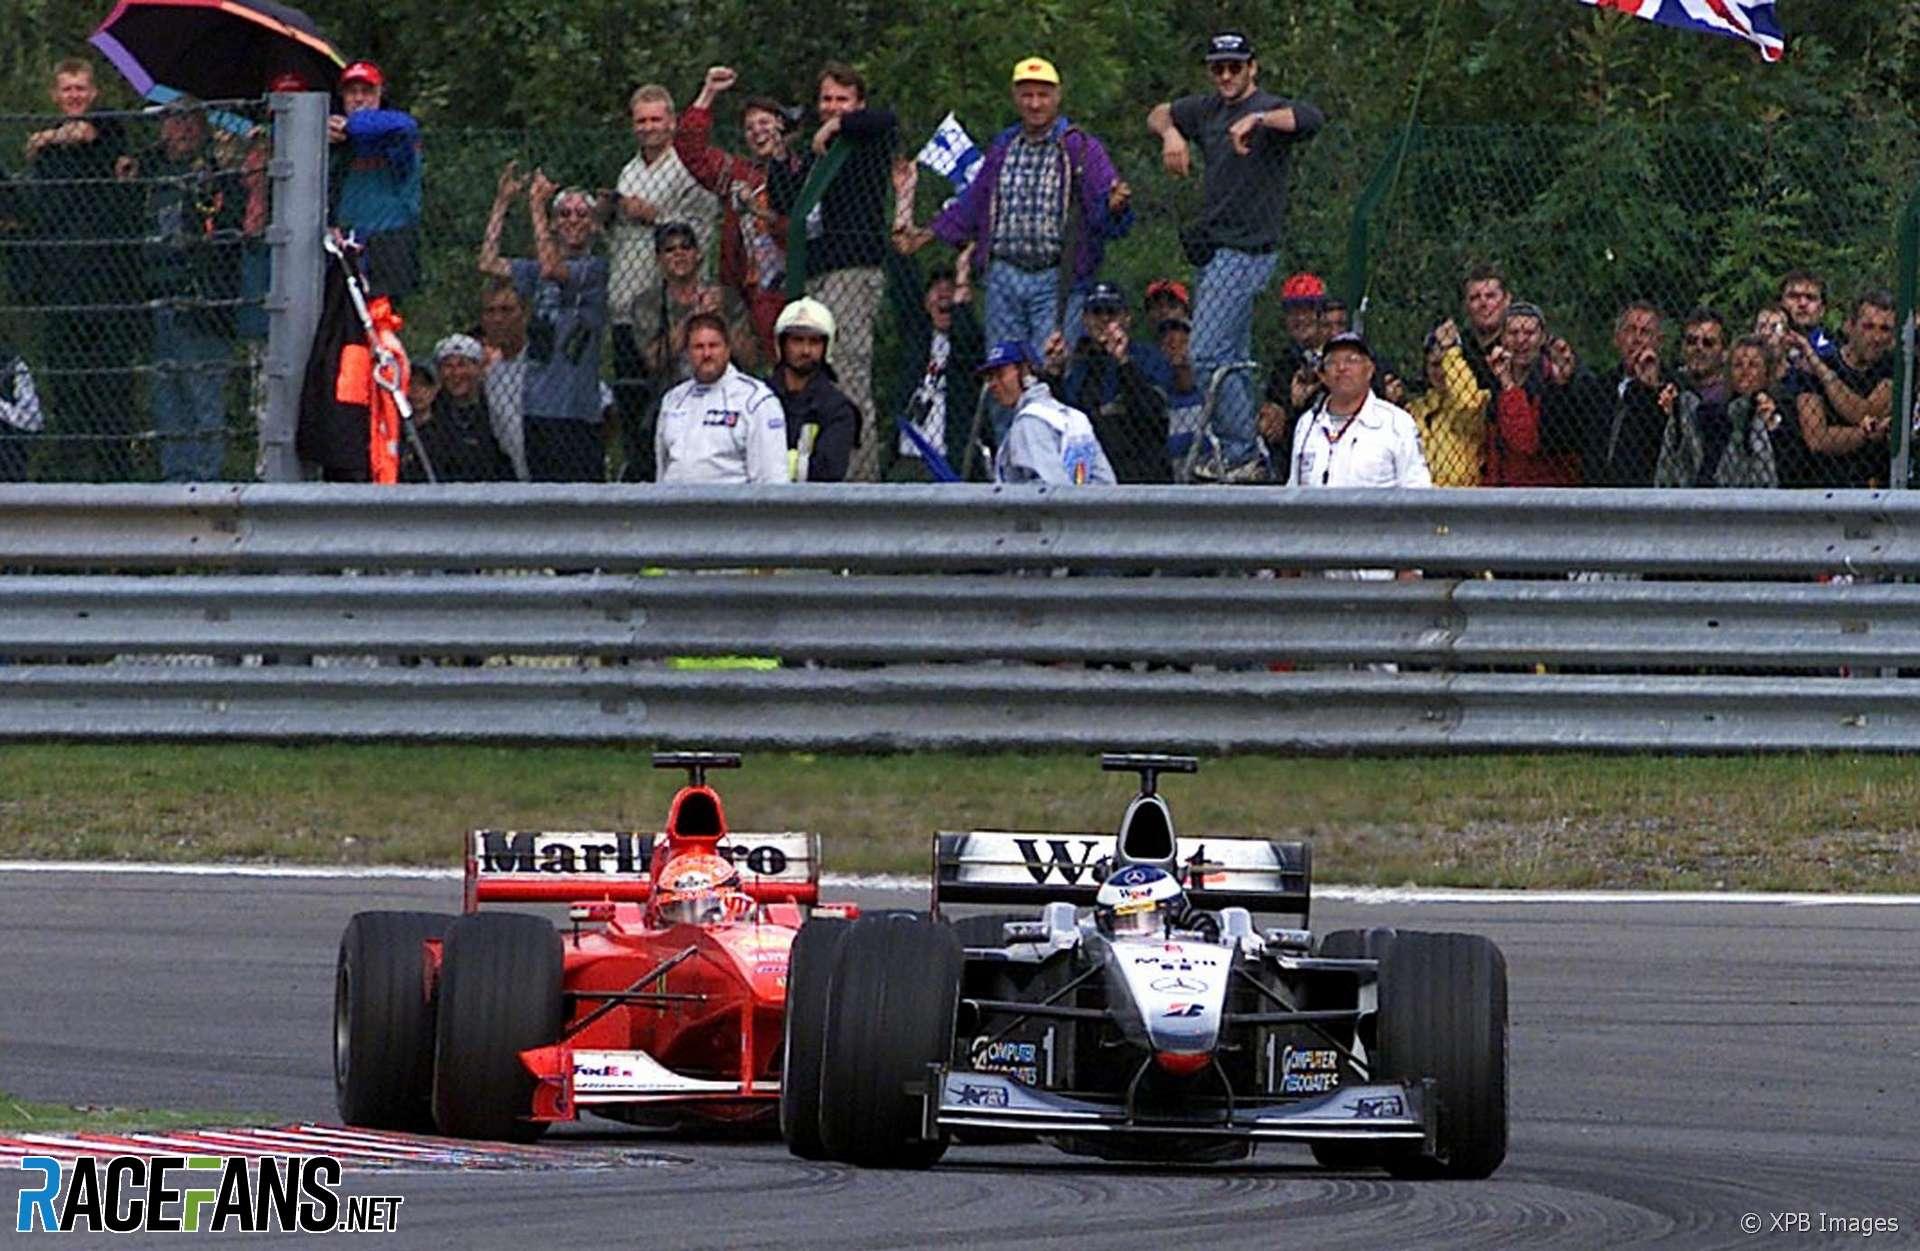 Mika Hakkinen, Michael Schumacher, Spa-Francorchamps, 2000